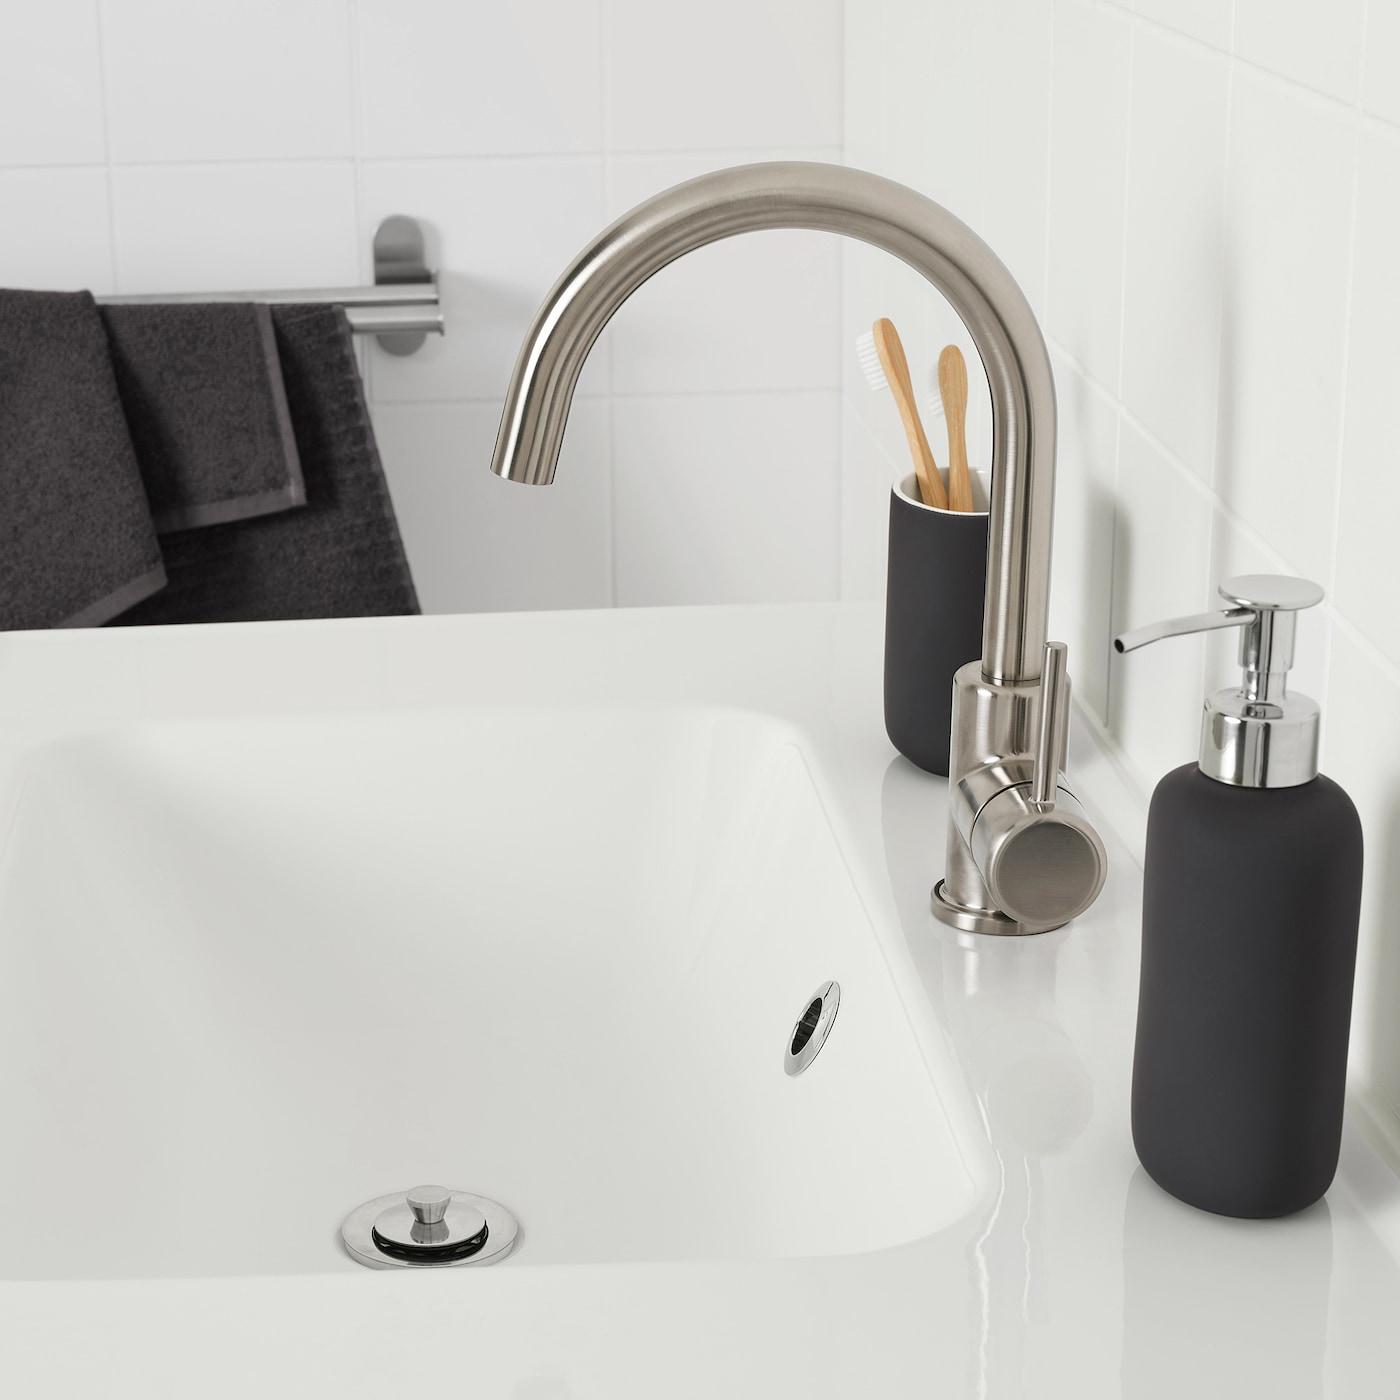 GLYPEN Mixer tap, stainless steel effect